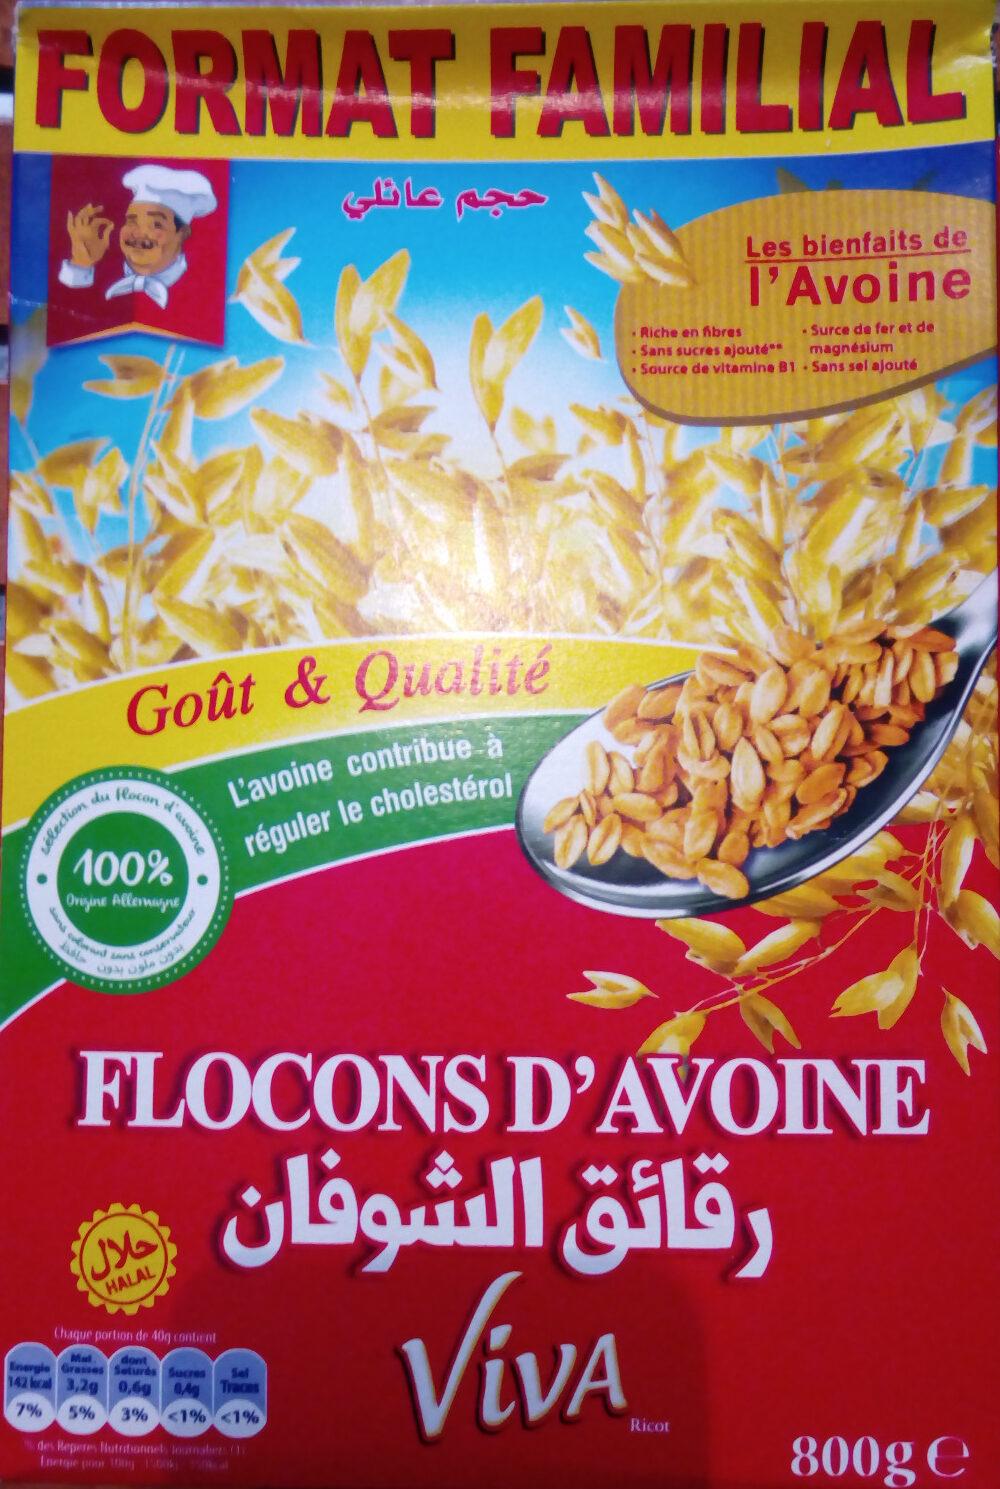 Flocons d'avoine - Product - fr